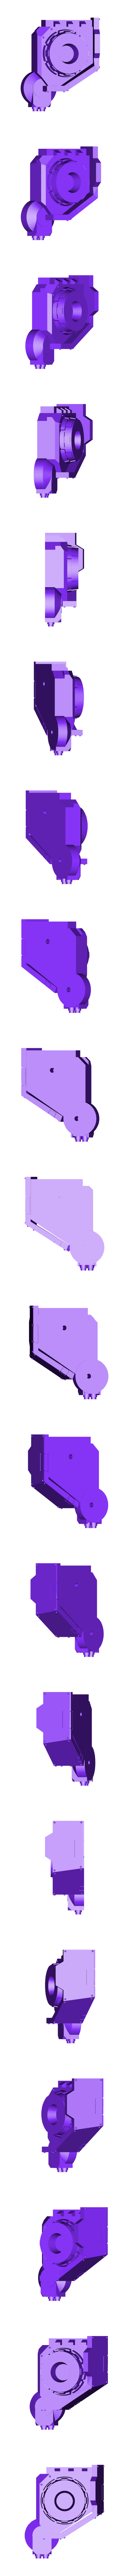 Print-TorsoR.stl Download free STL file Windup Automated Mausoleum for Nearly Dead Oversized Interstellar Jarheads • 3D printable template, FelixTheCrazy